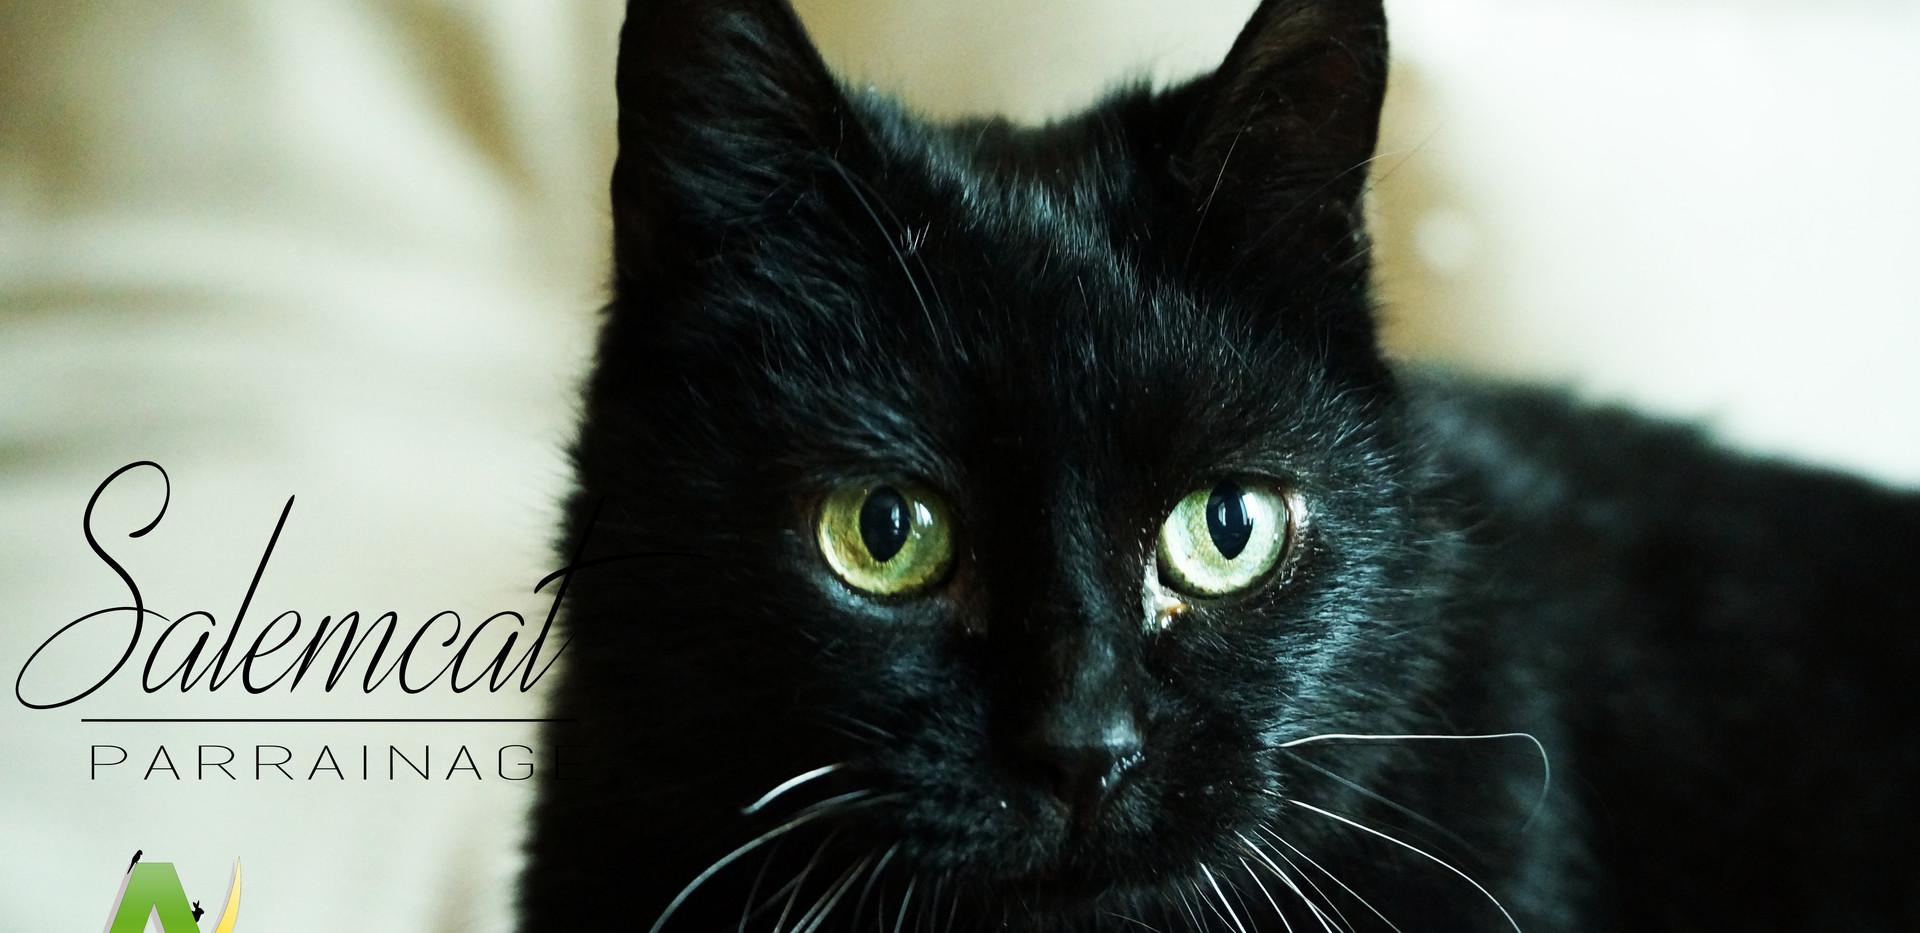 Salemcat